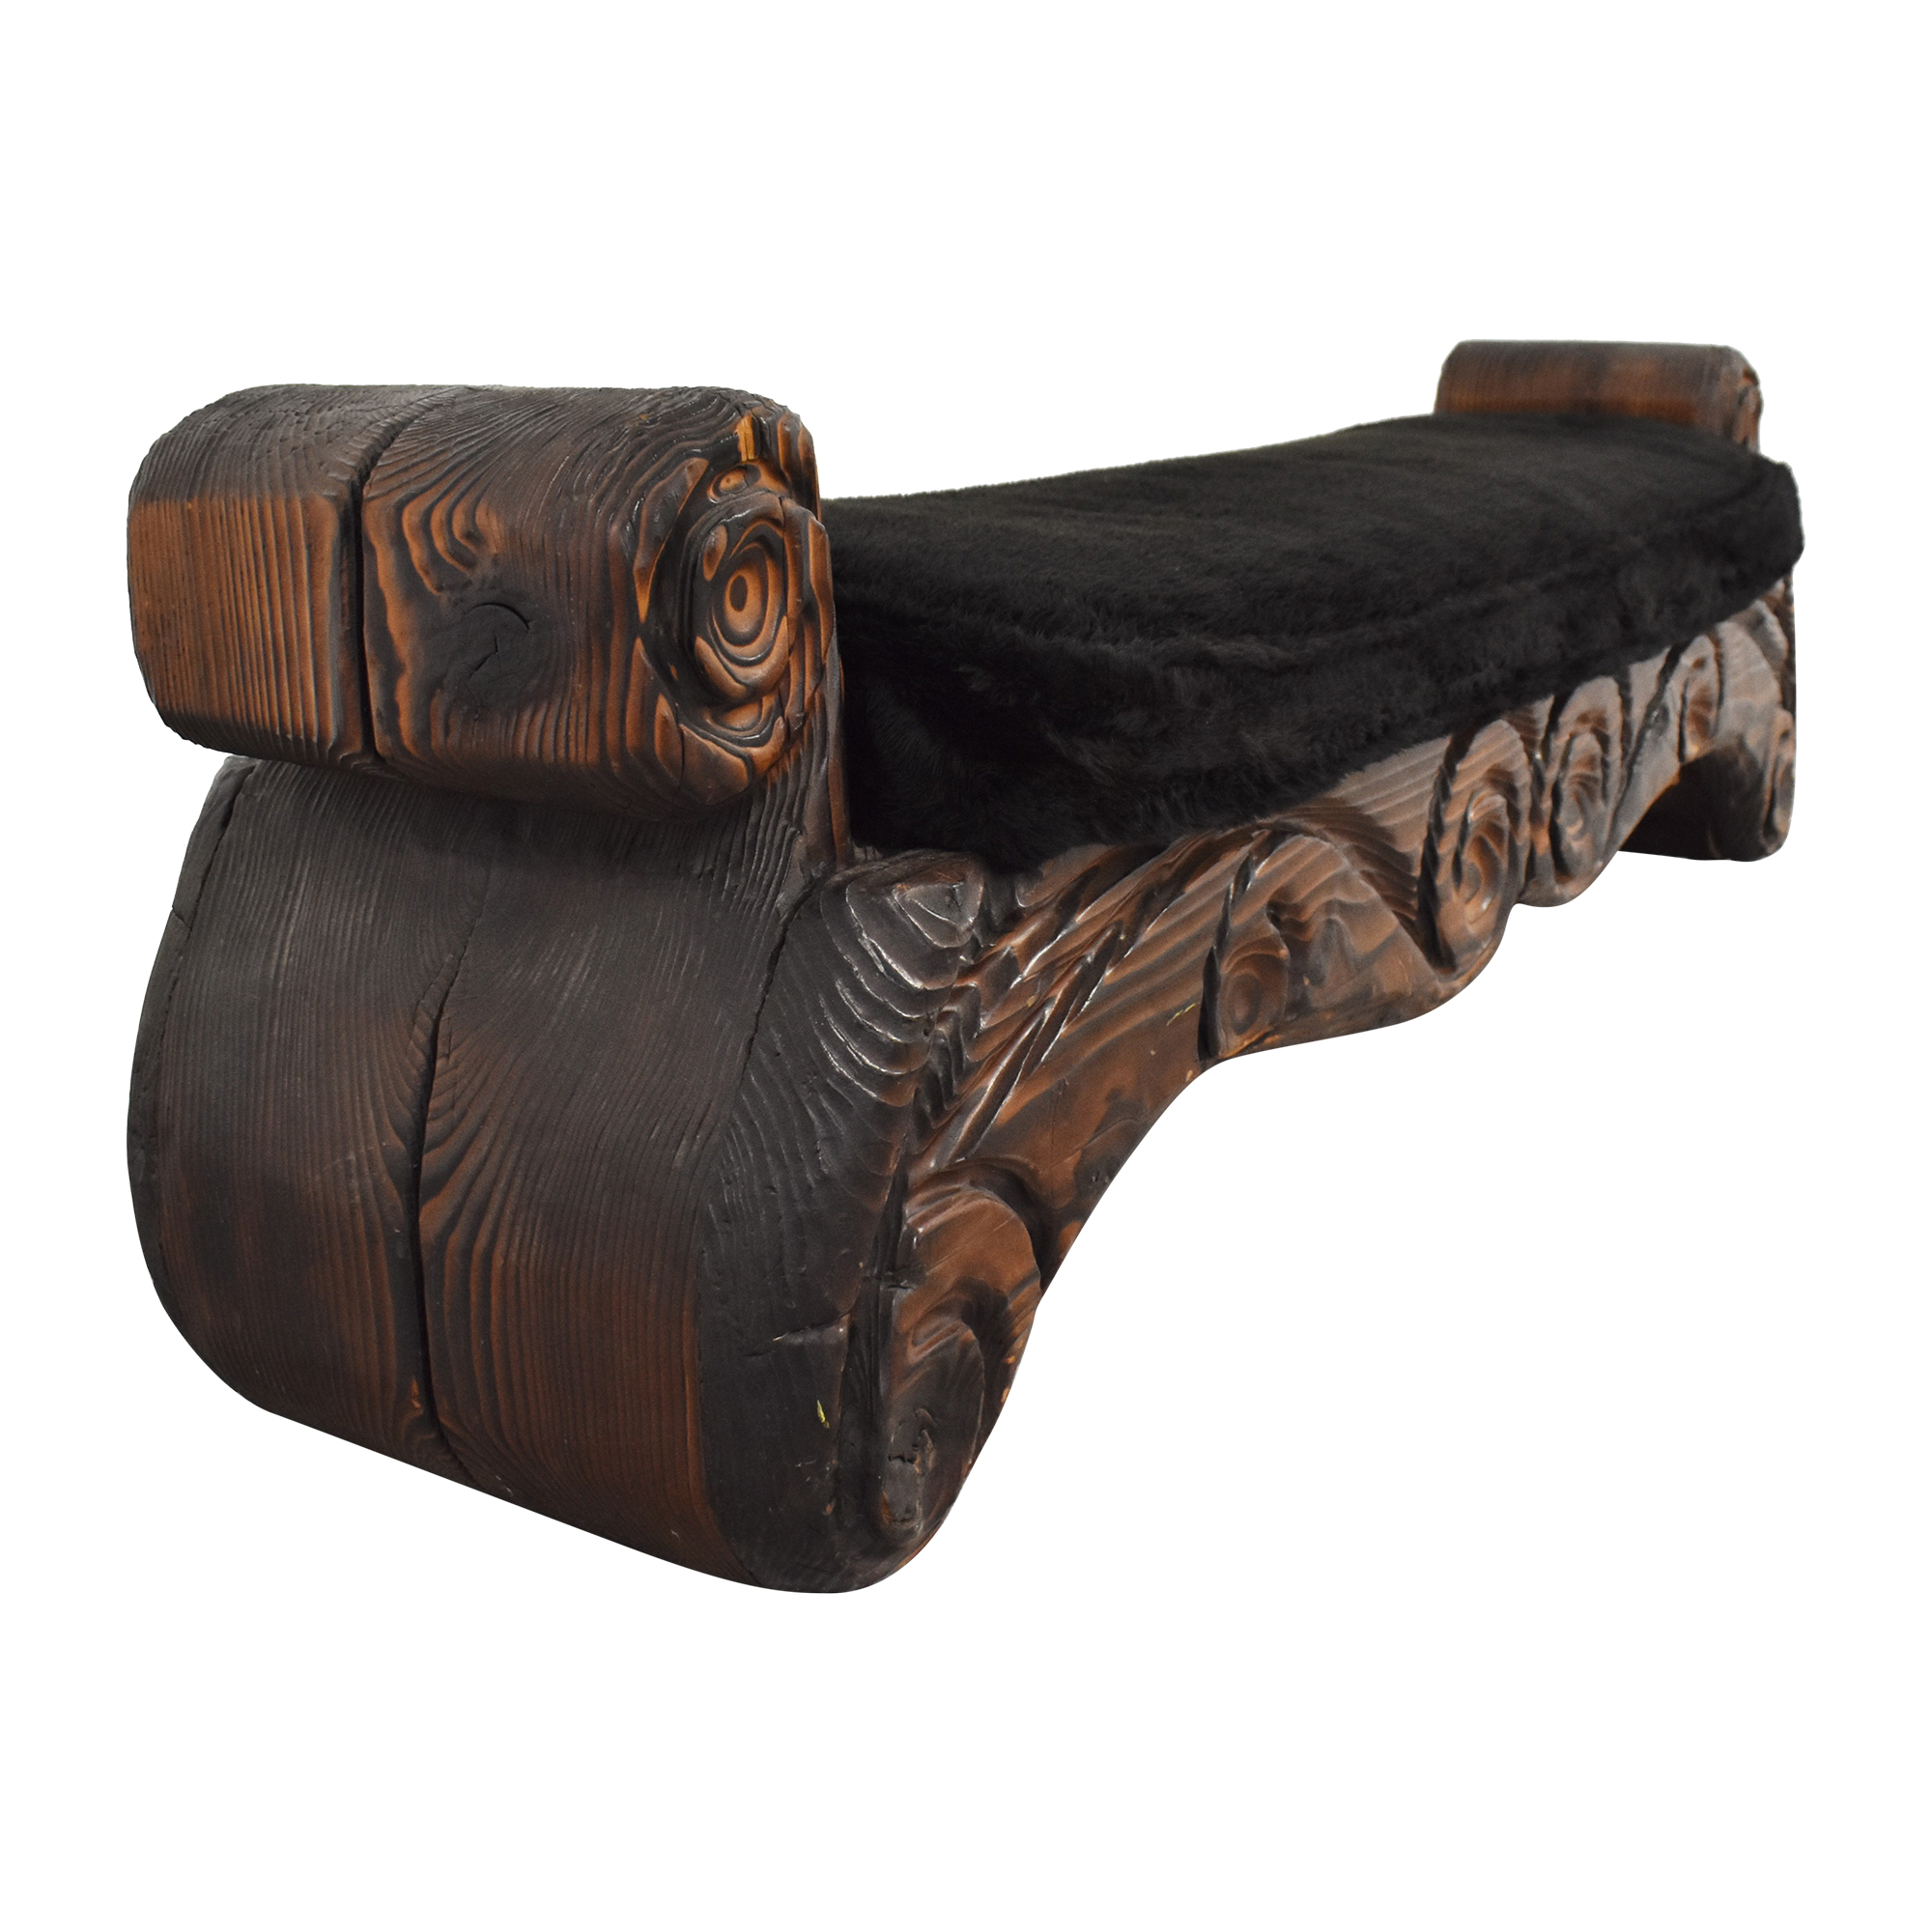 buy Witco Decor Bench Witco Decor Chairs